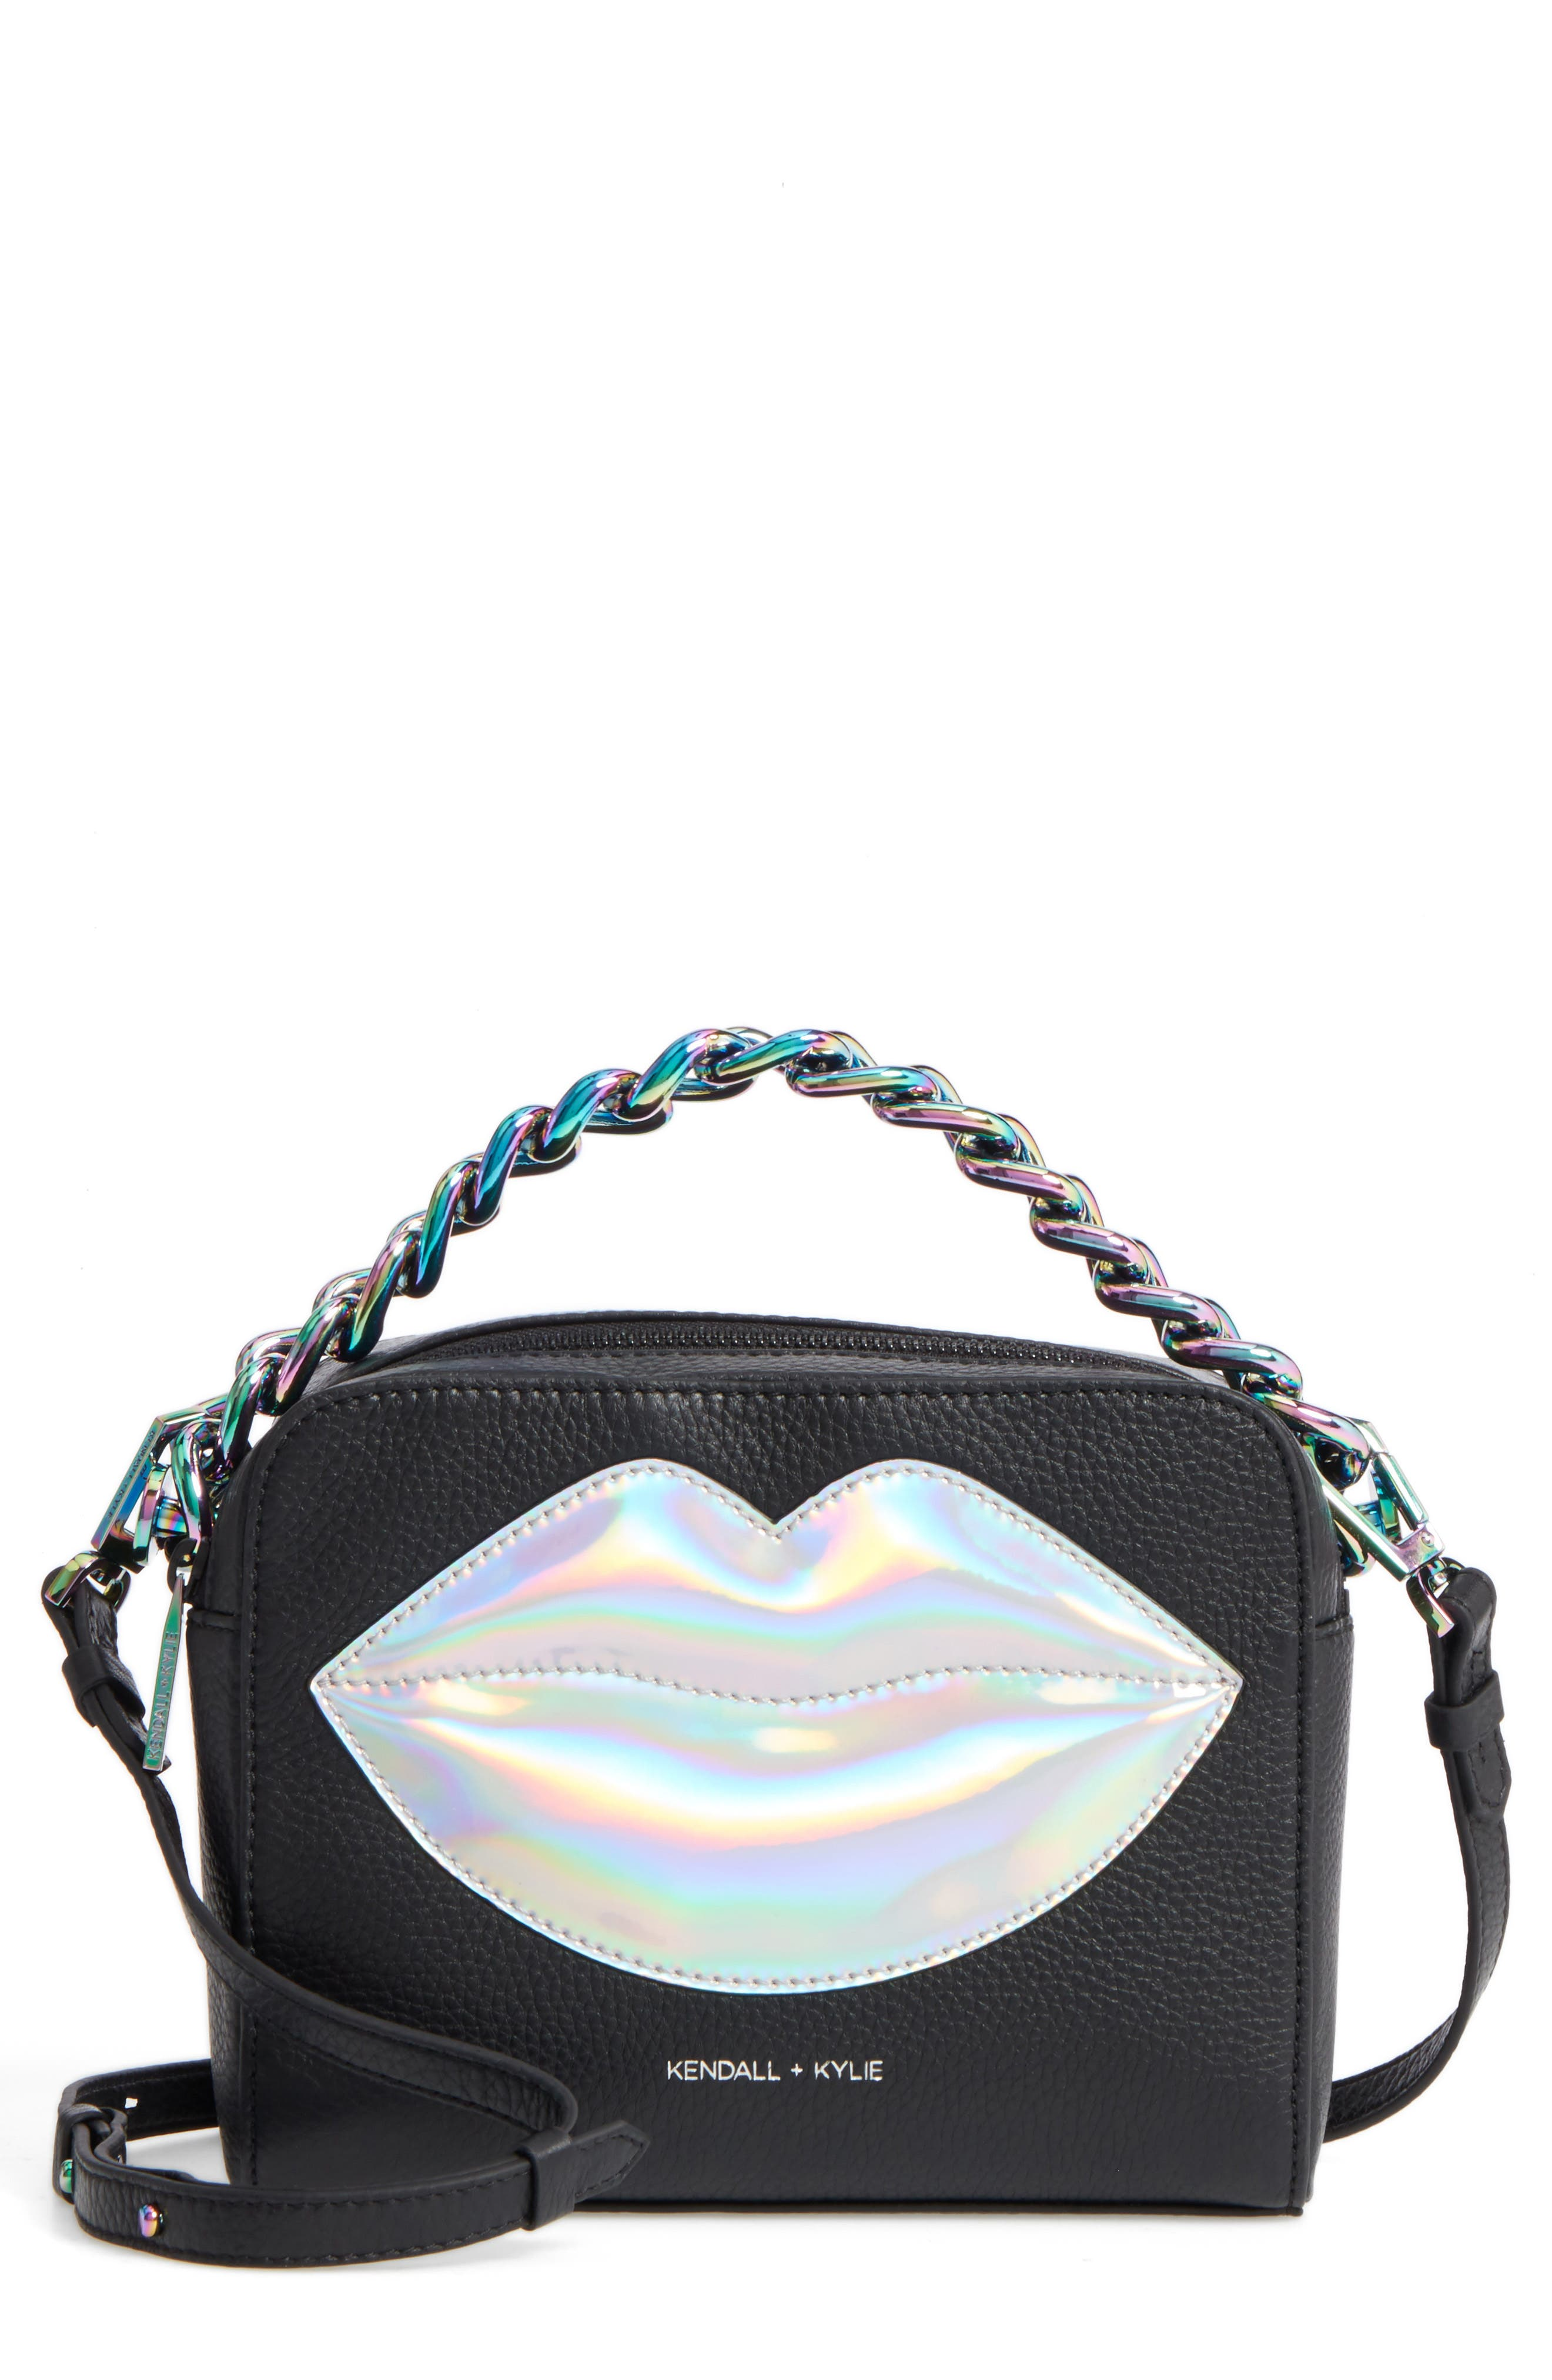 Lucy Lips Crossbody Bag,                             Main thumbnail 1, color,                             001